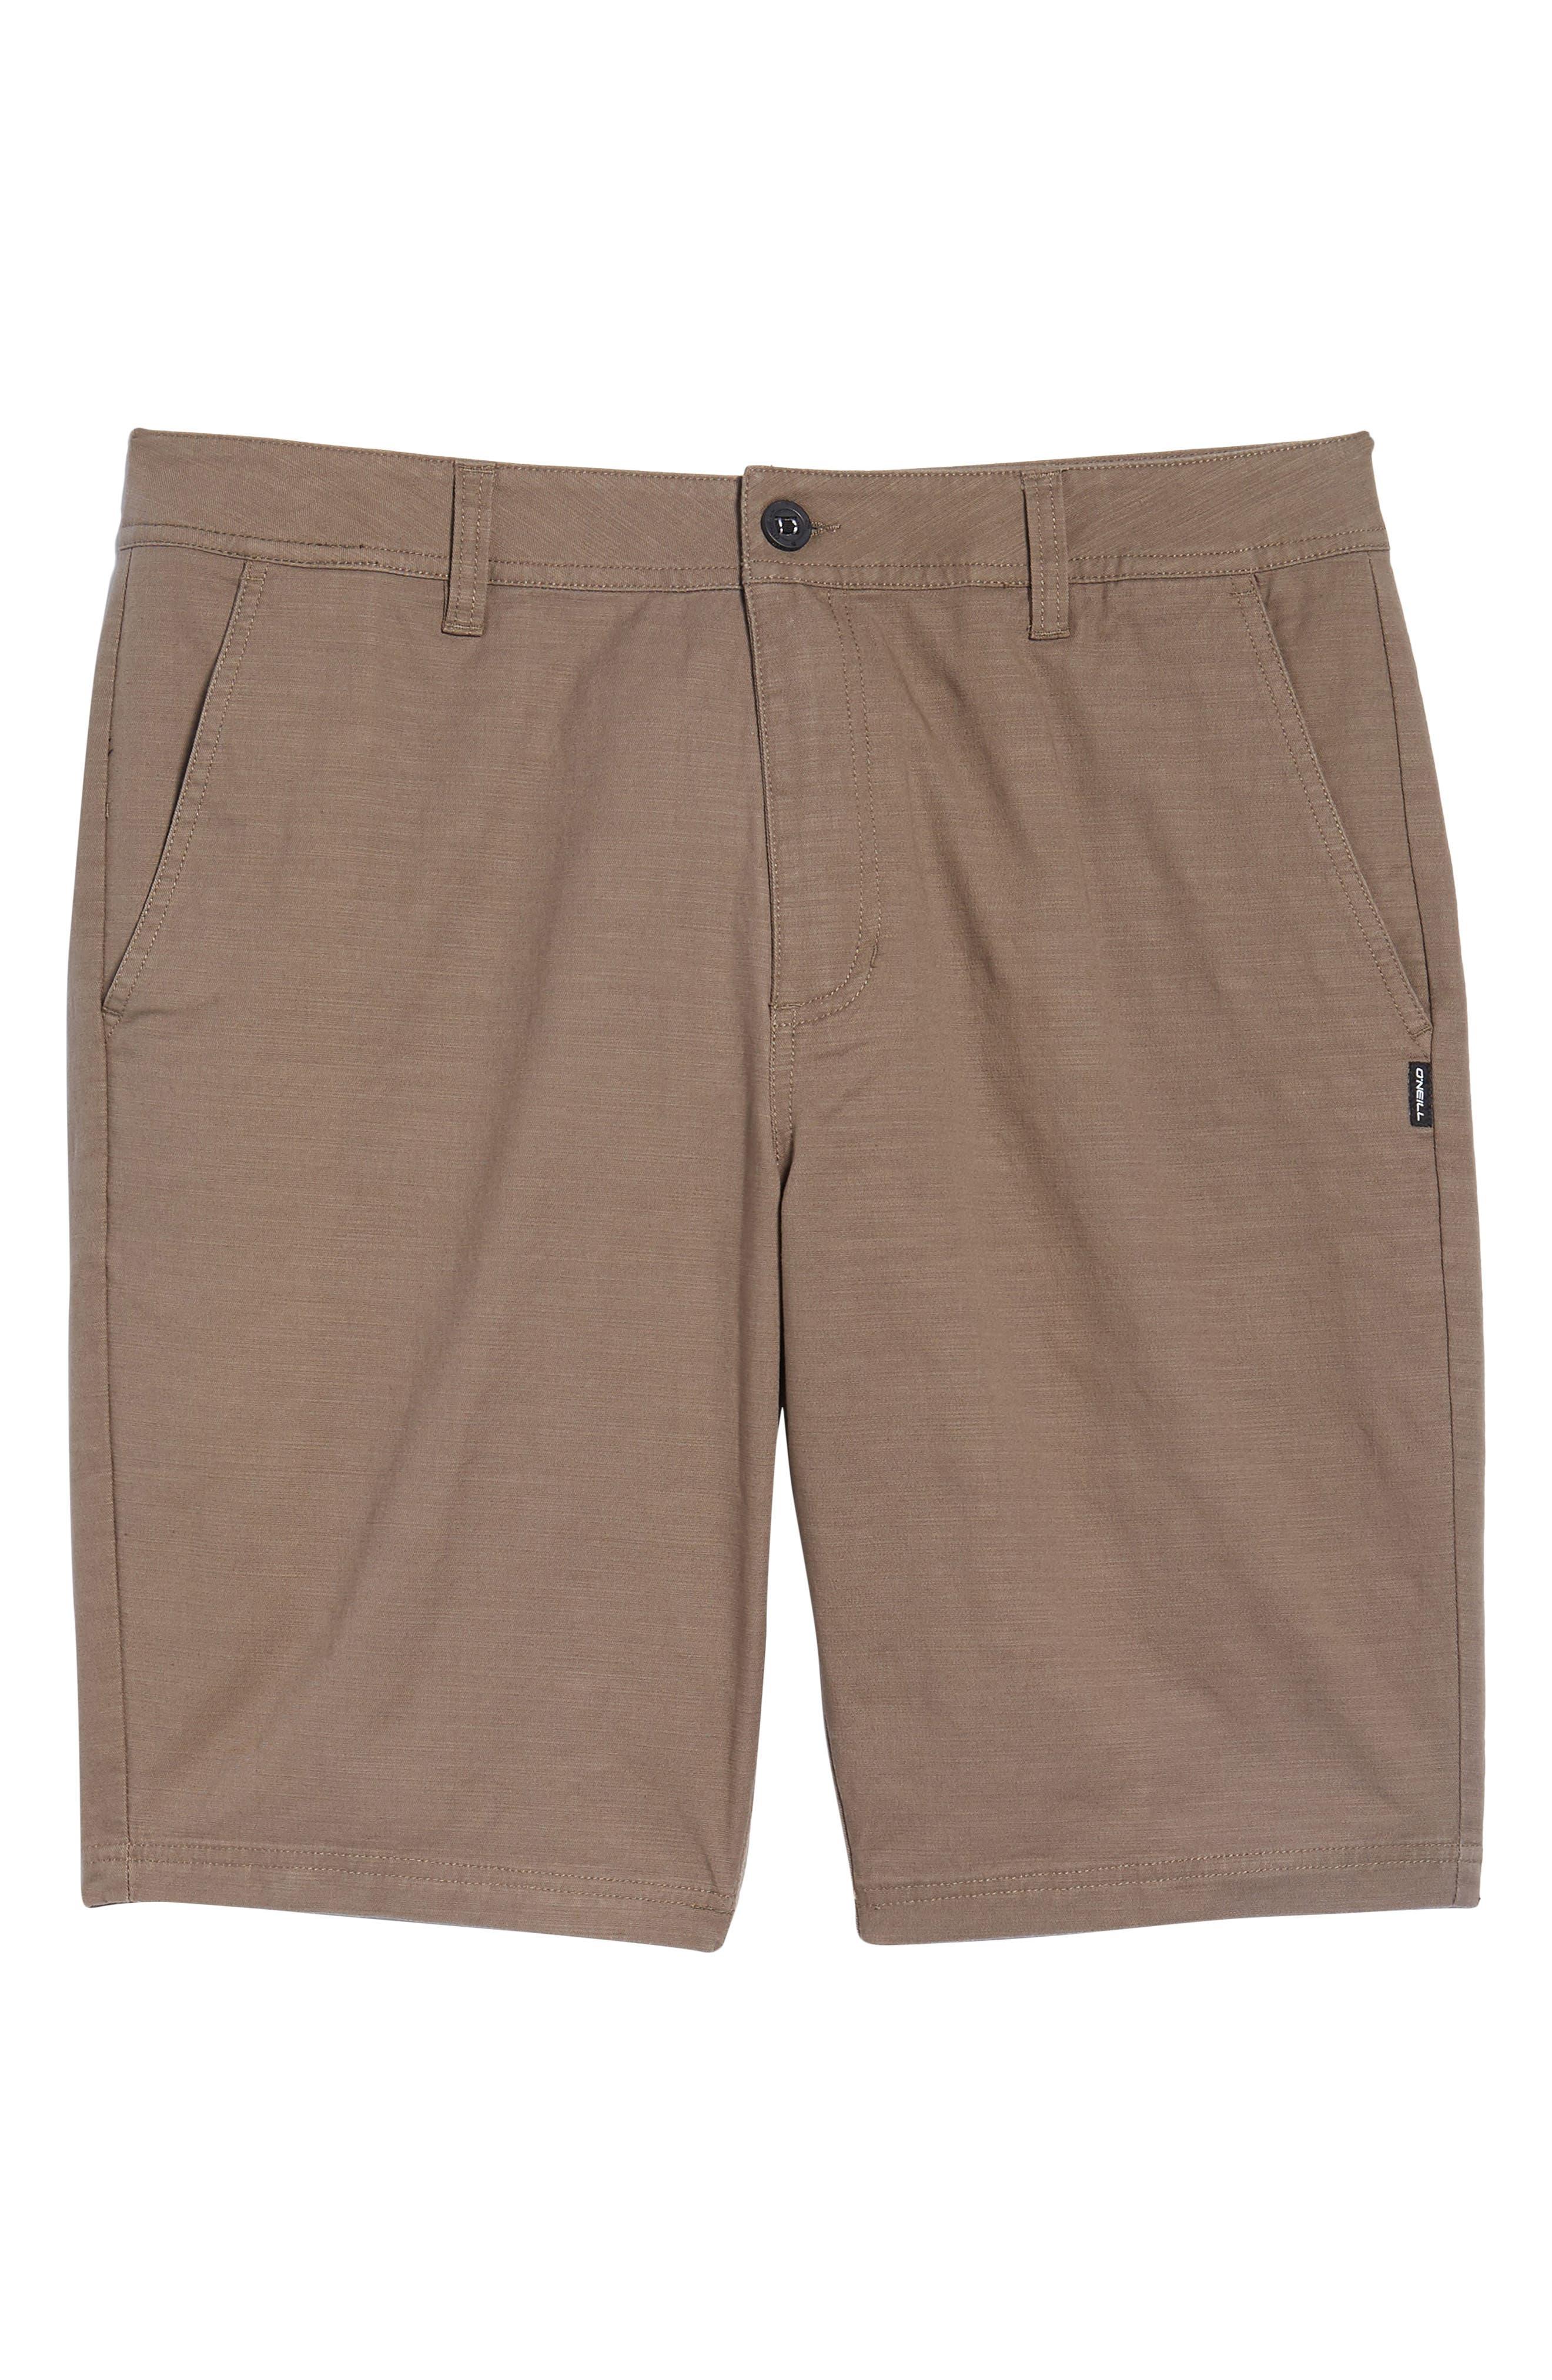 Jay Stretch Chino Shorts,                             Alternate thumbnail 29, color,